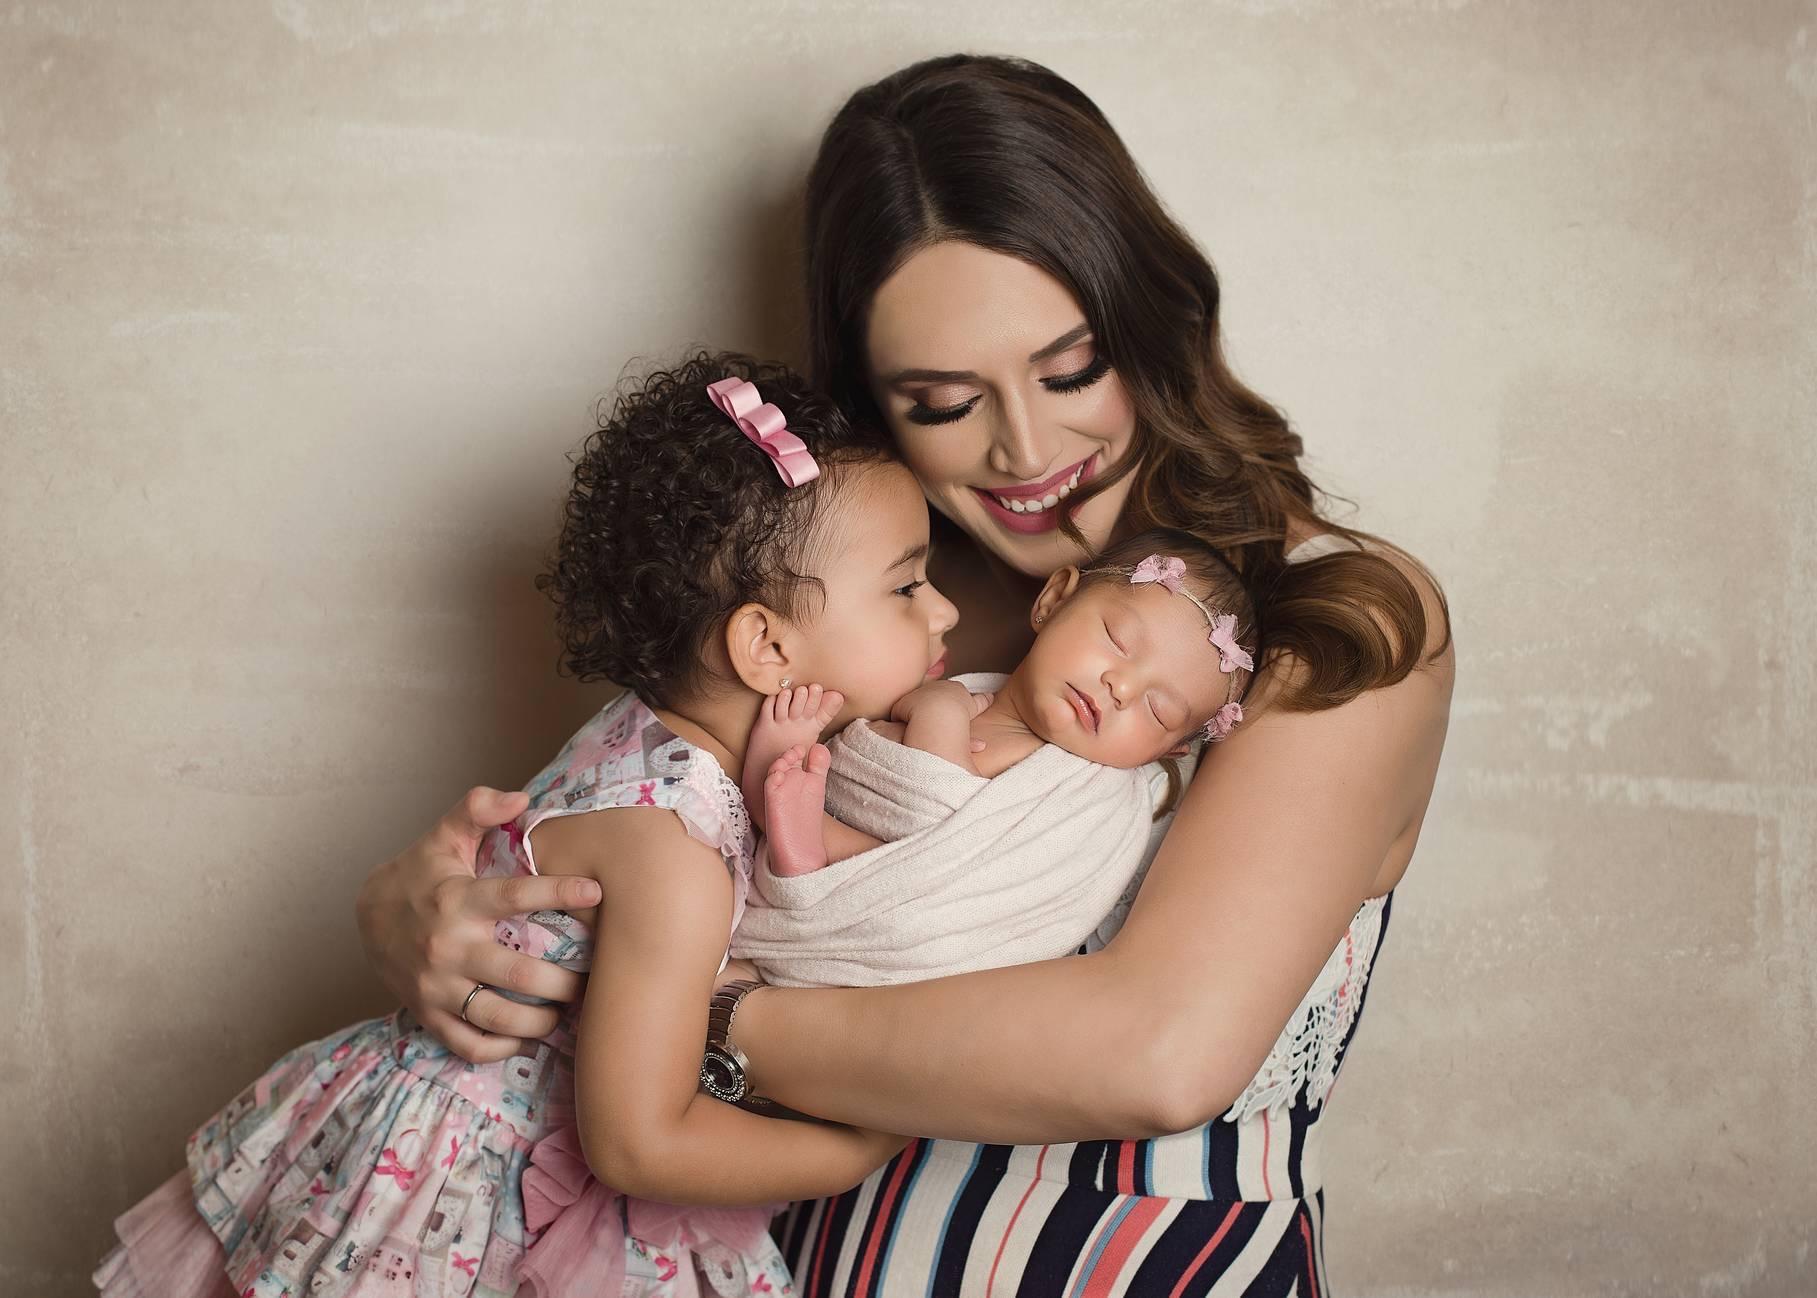 Romina, Cristina y Cristina